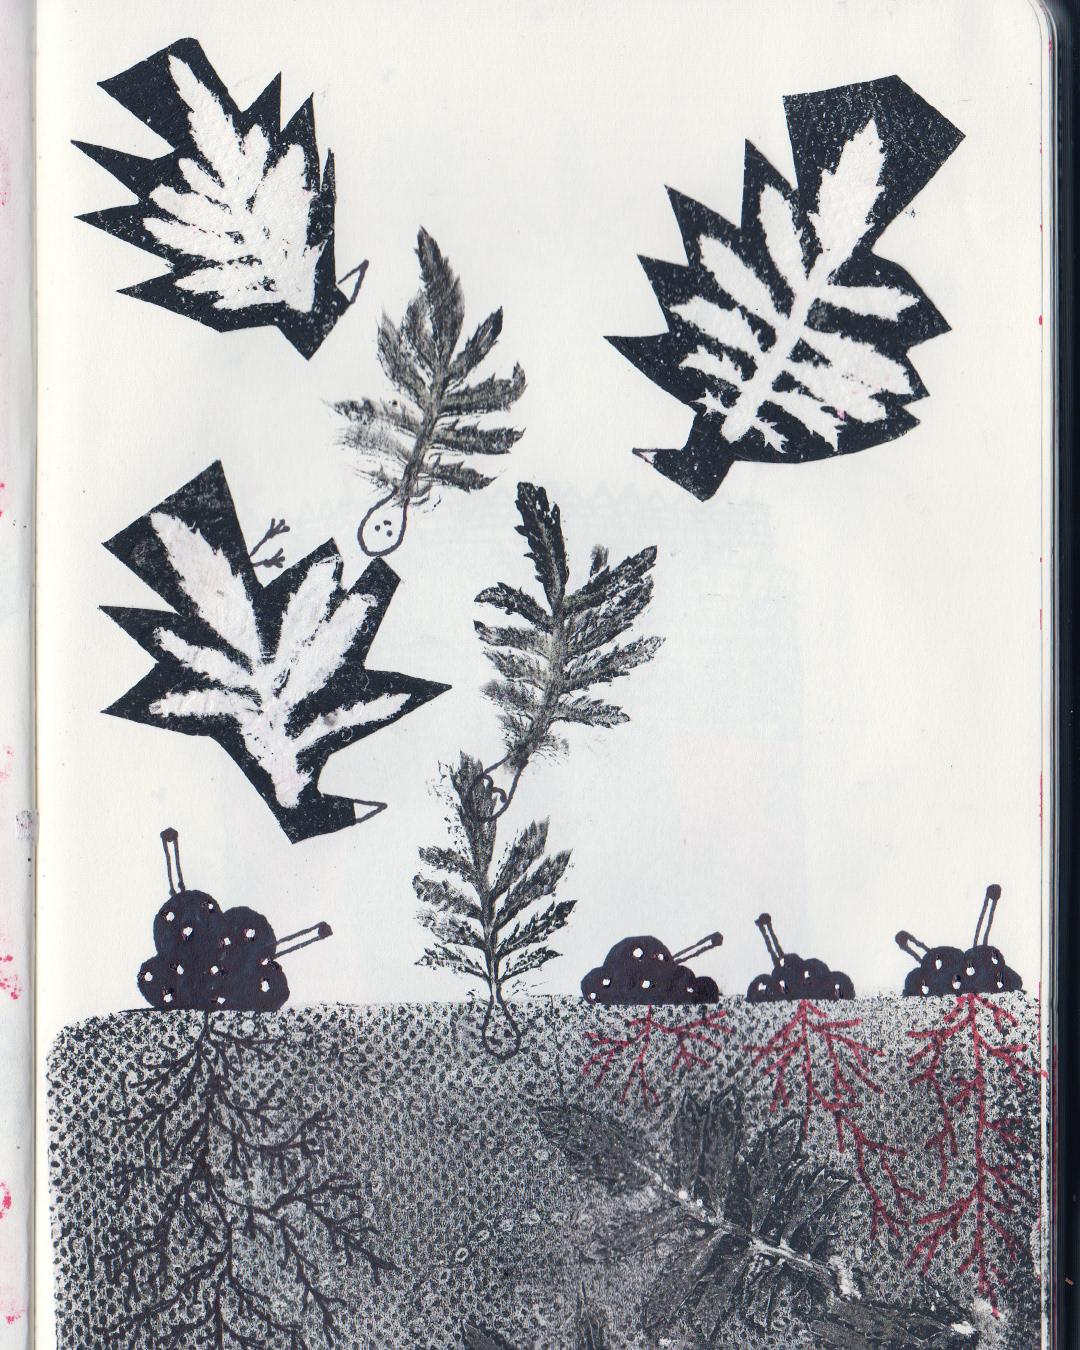 Image may contain: tree, art and drawing